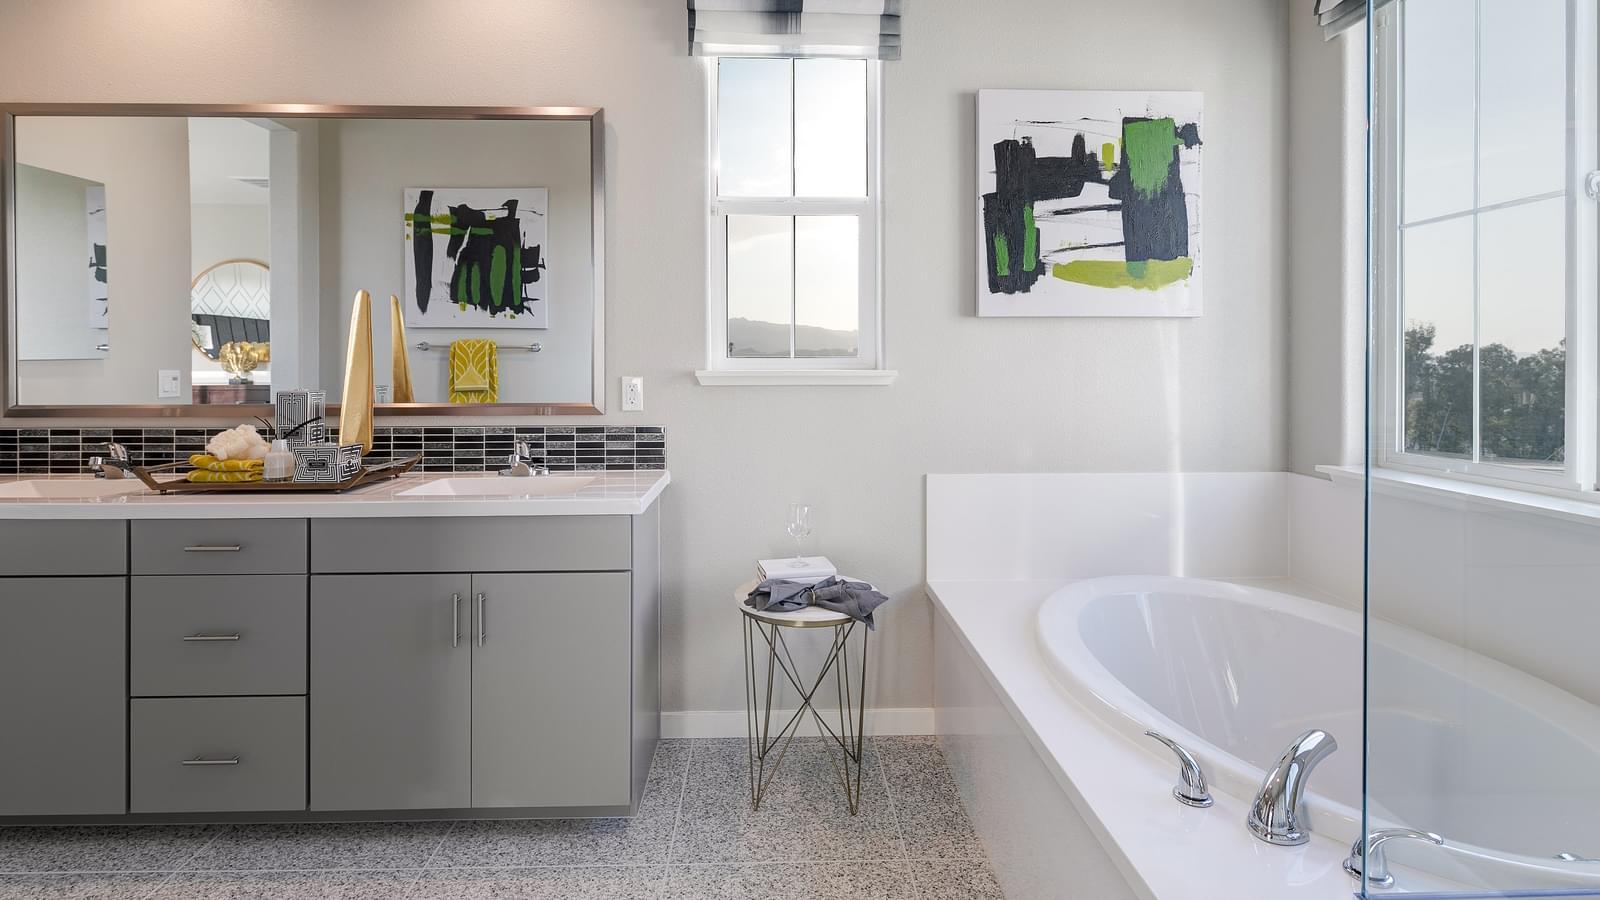 Residence 3 Master Bath